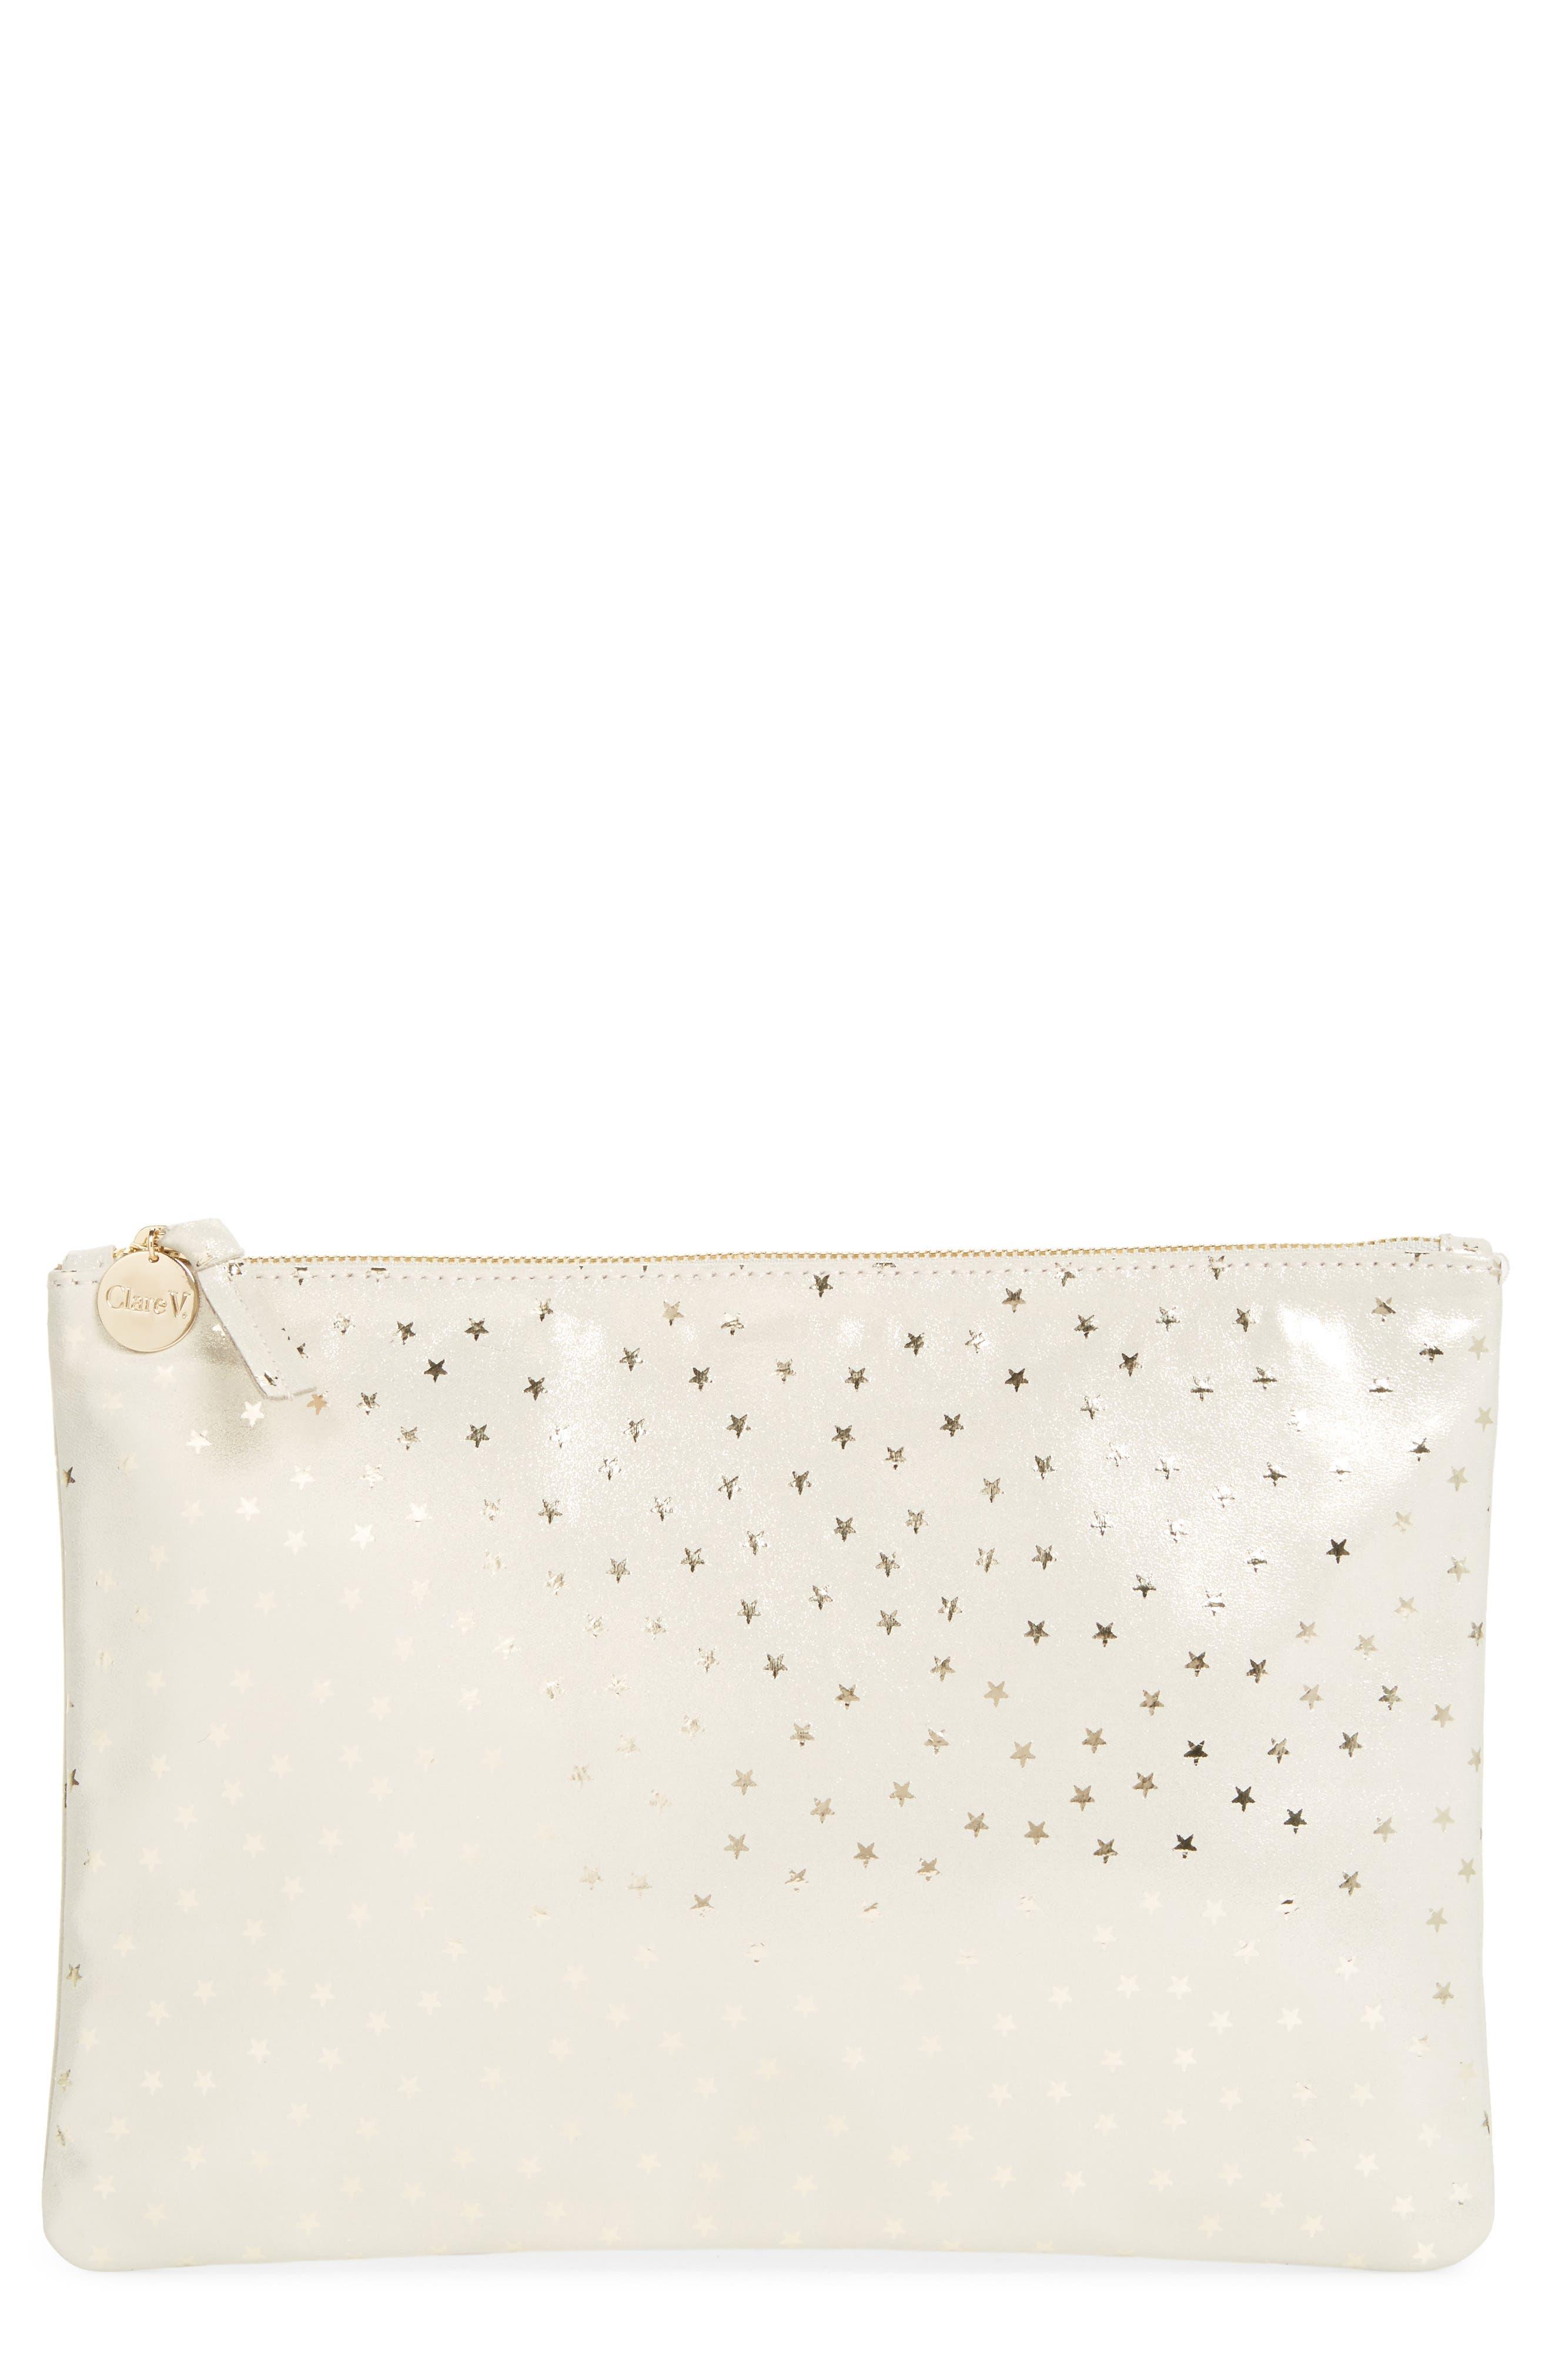 Clare V. Star Shimmer Suede Flat Clutch